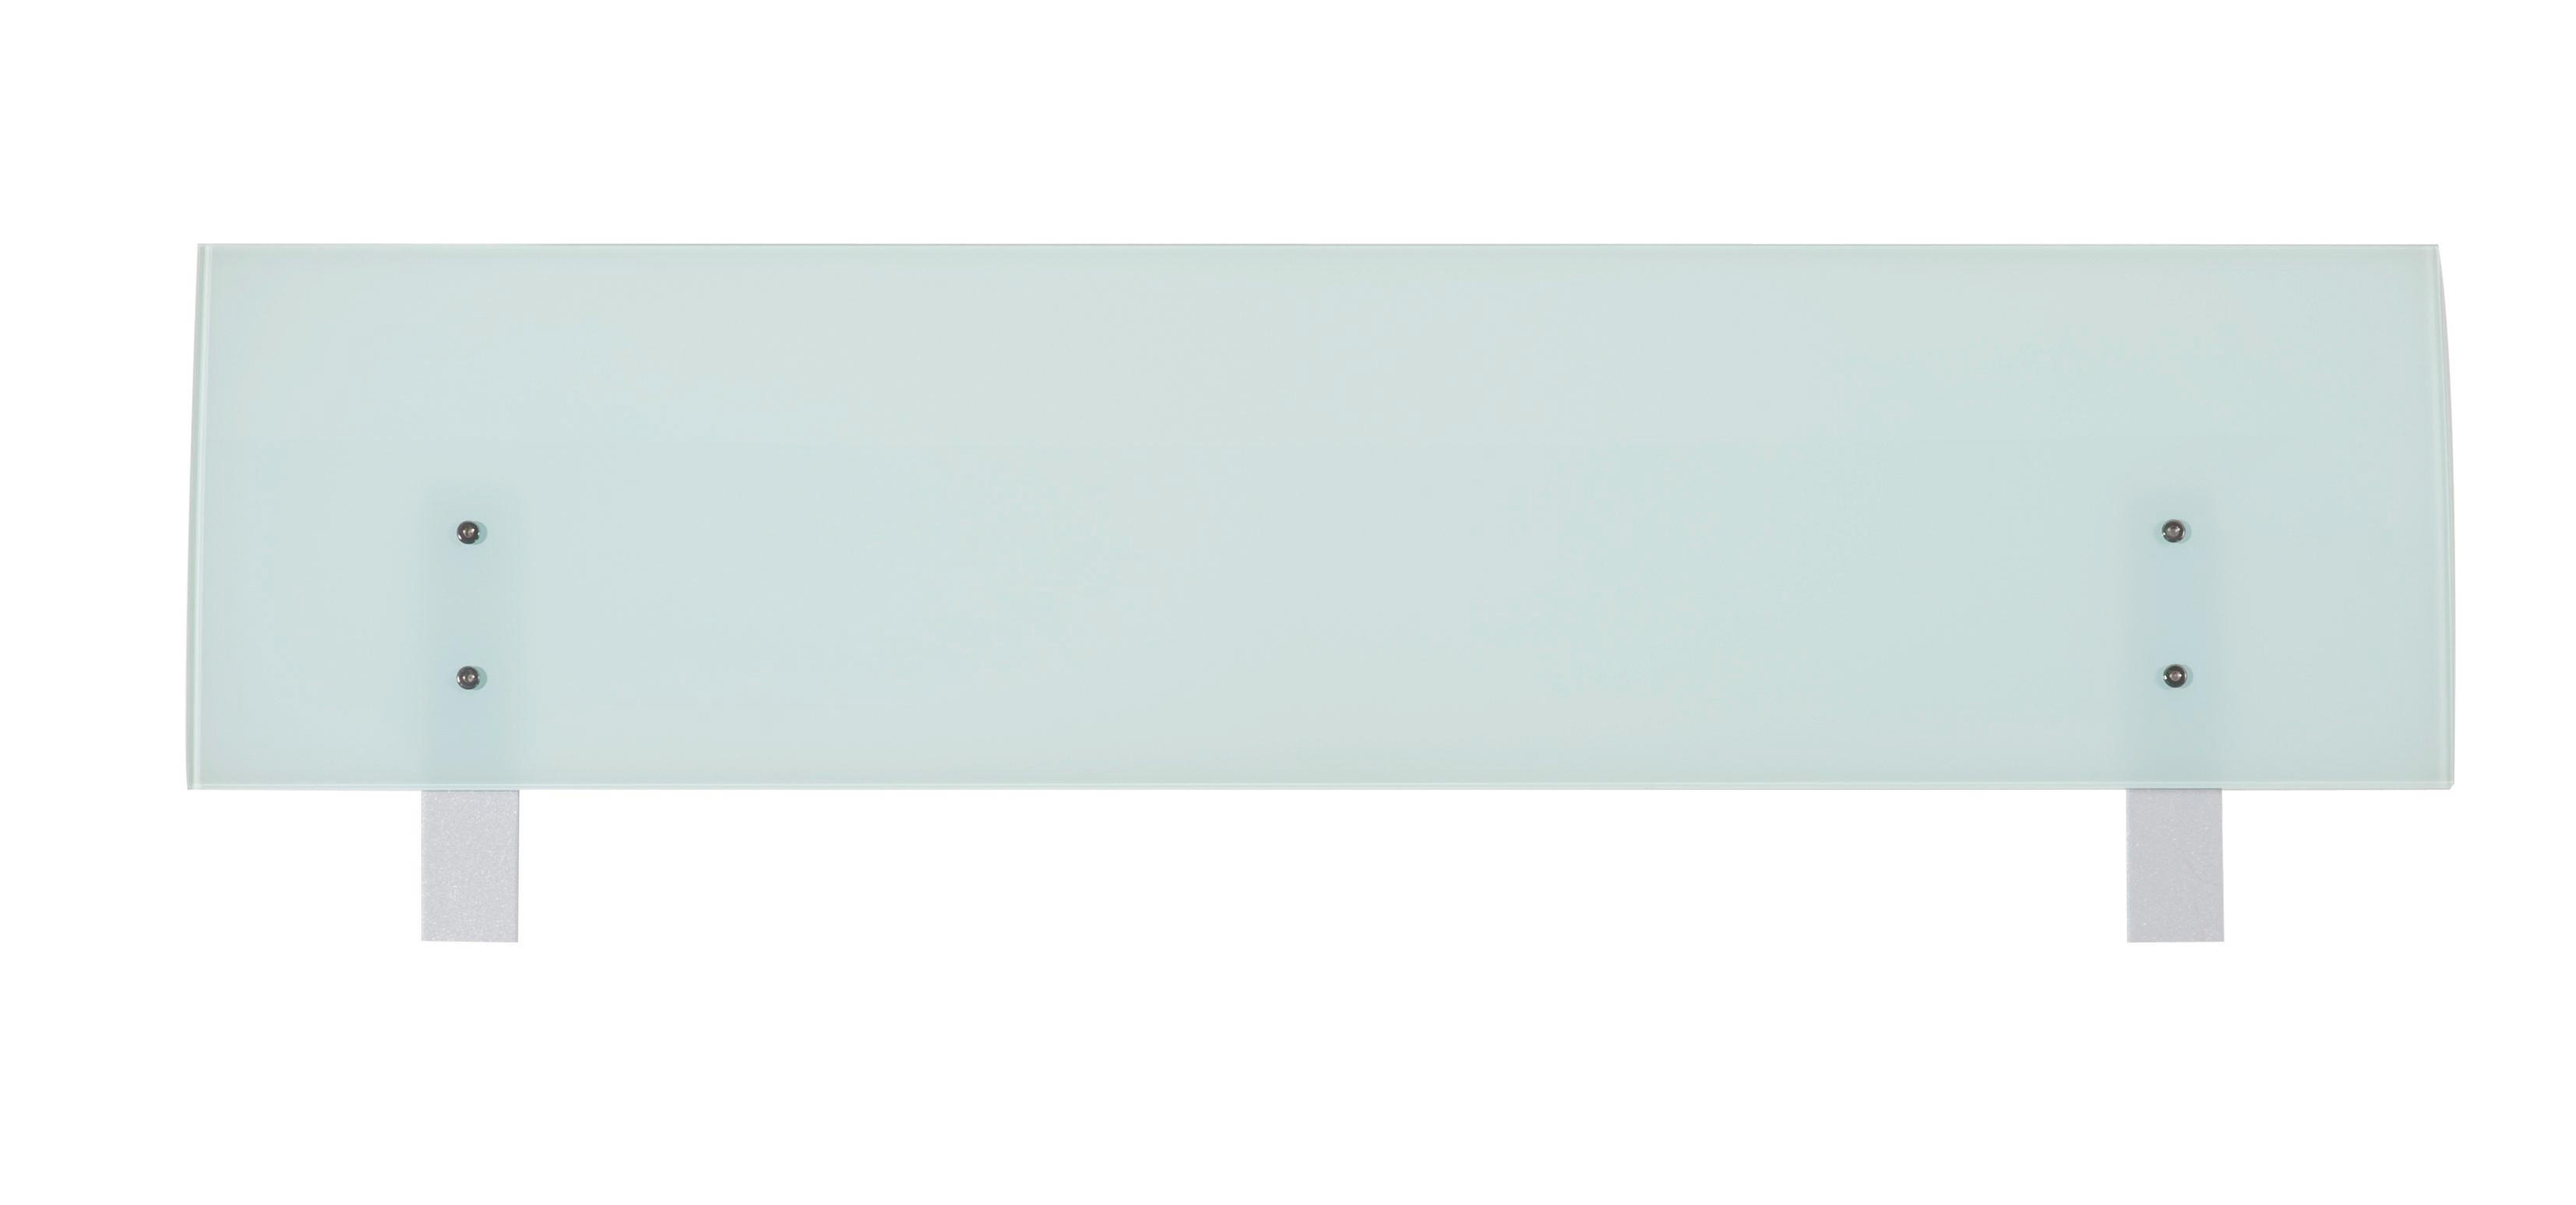 KOPFTEIL  141/48 cm - MODERN, Glas (141/48cm) - XORA